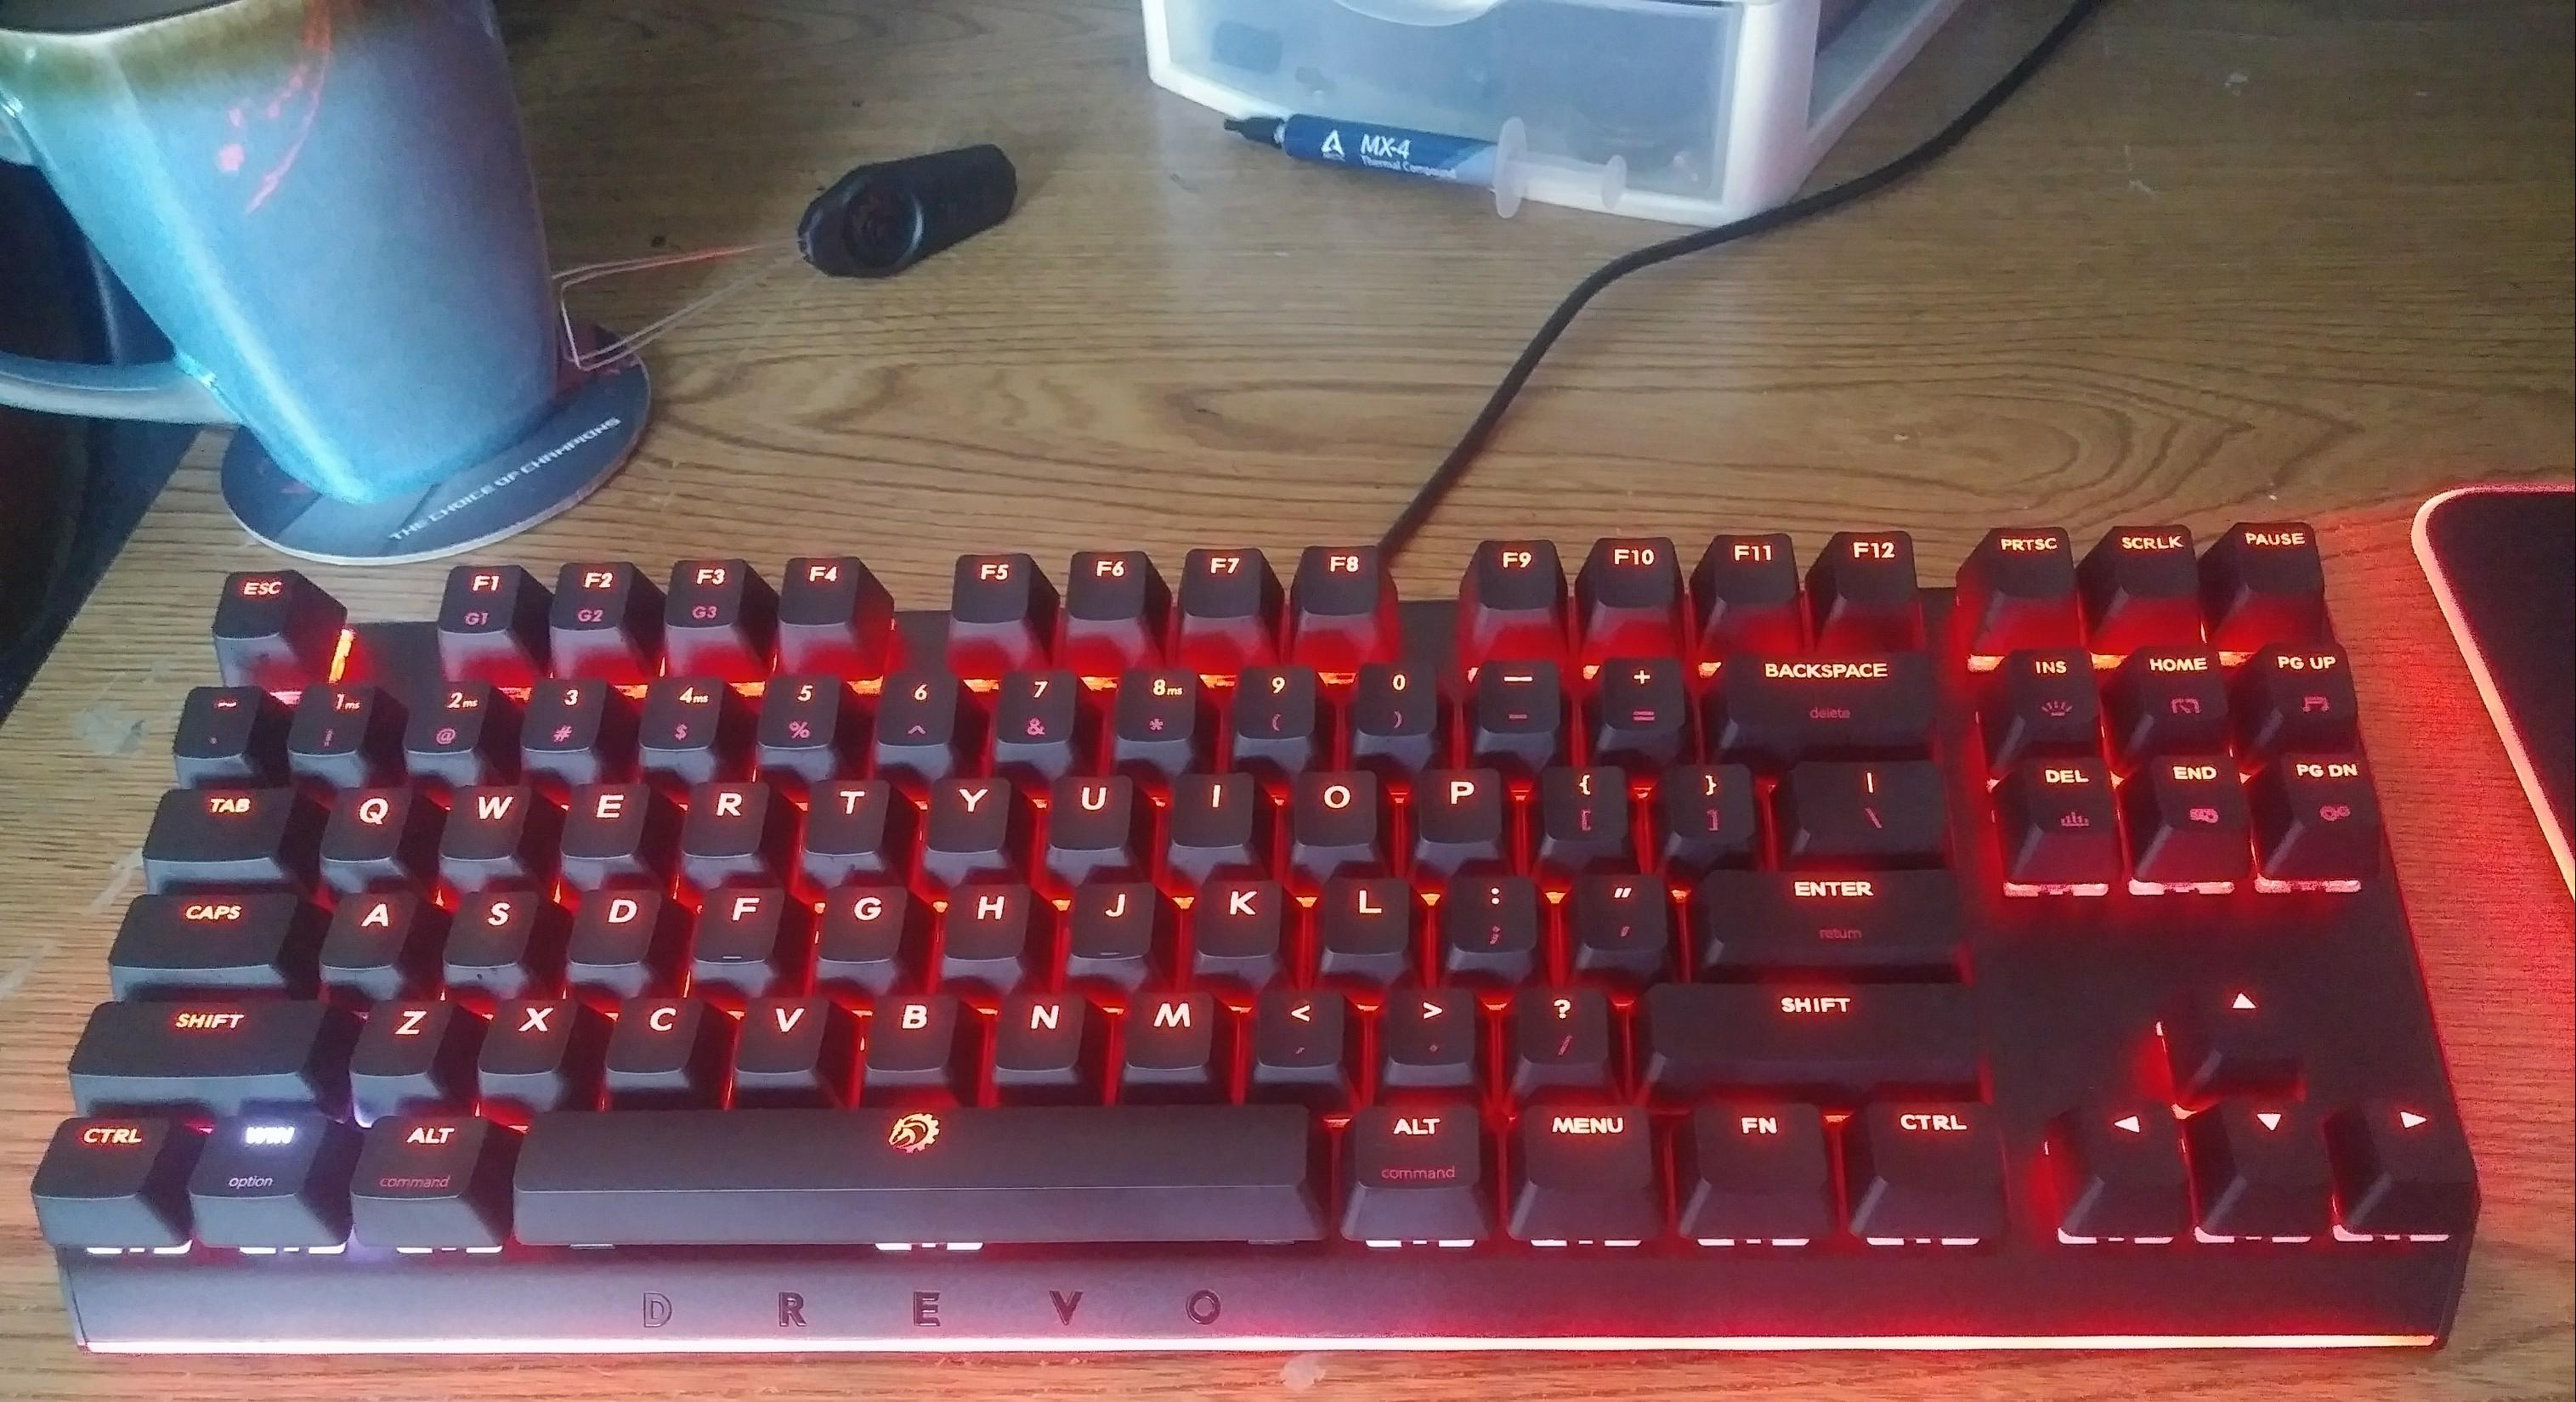 DREVO Blademaster TE 87-Key Mechanical RGB Keyboard with Genius-Knob